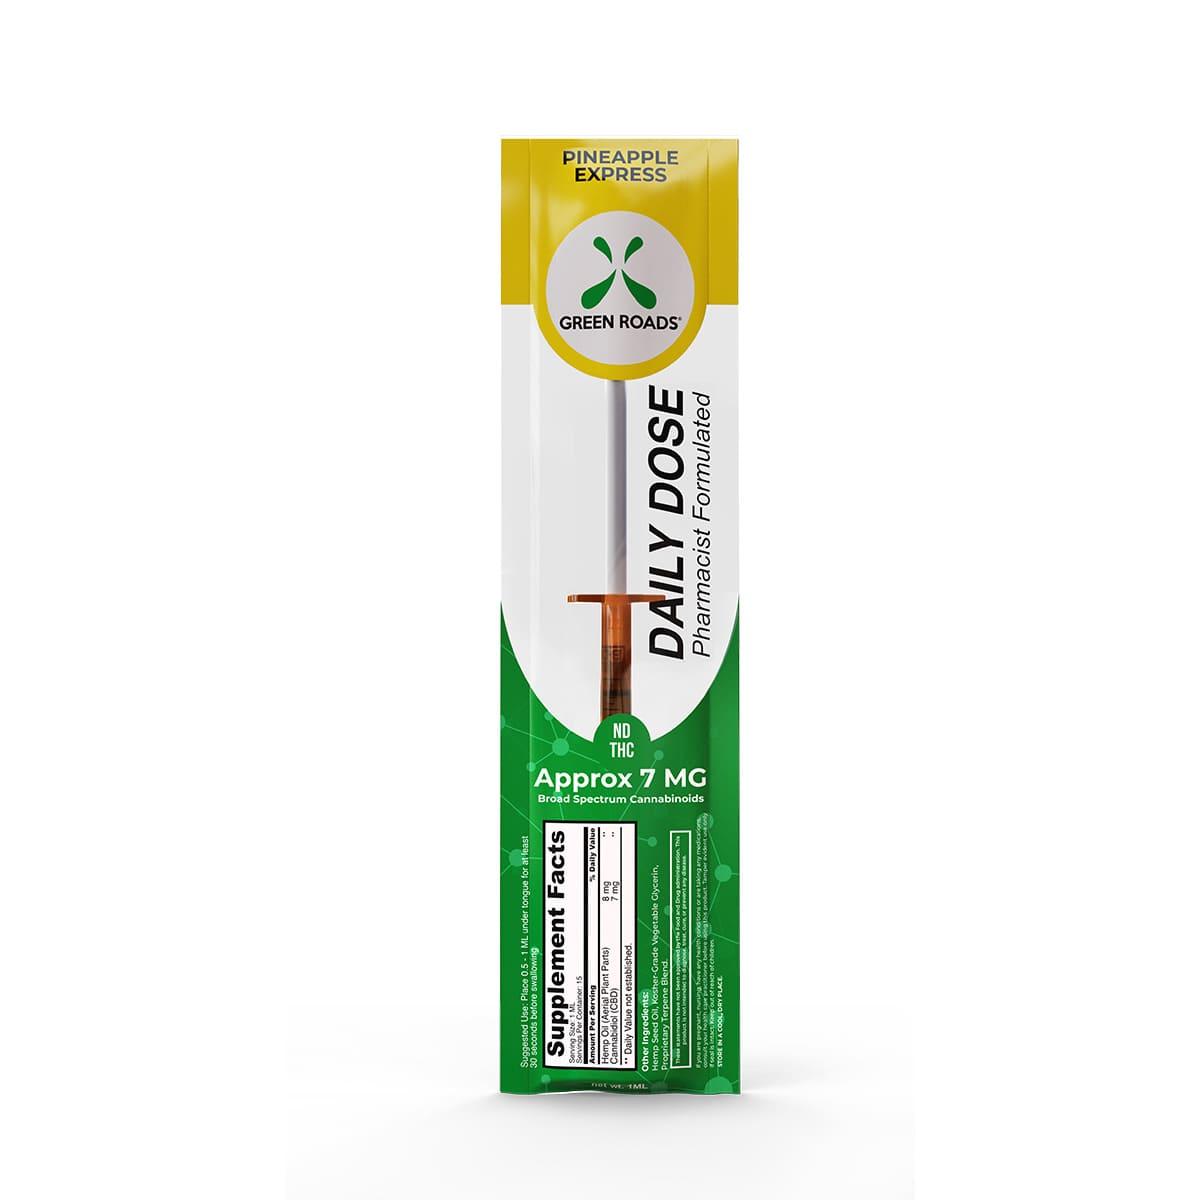 Green Roads Pineapple Express CBD Daily Dose - 7mg CBD (7mg CBD per dose) - 1ml